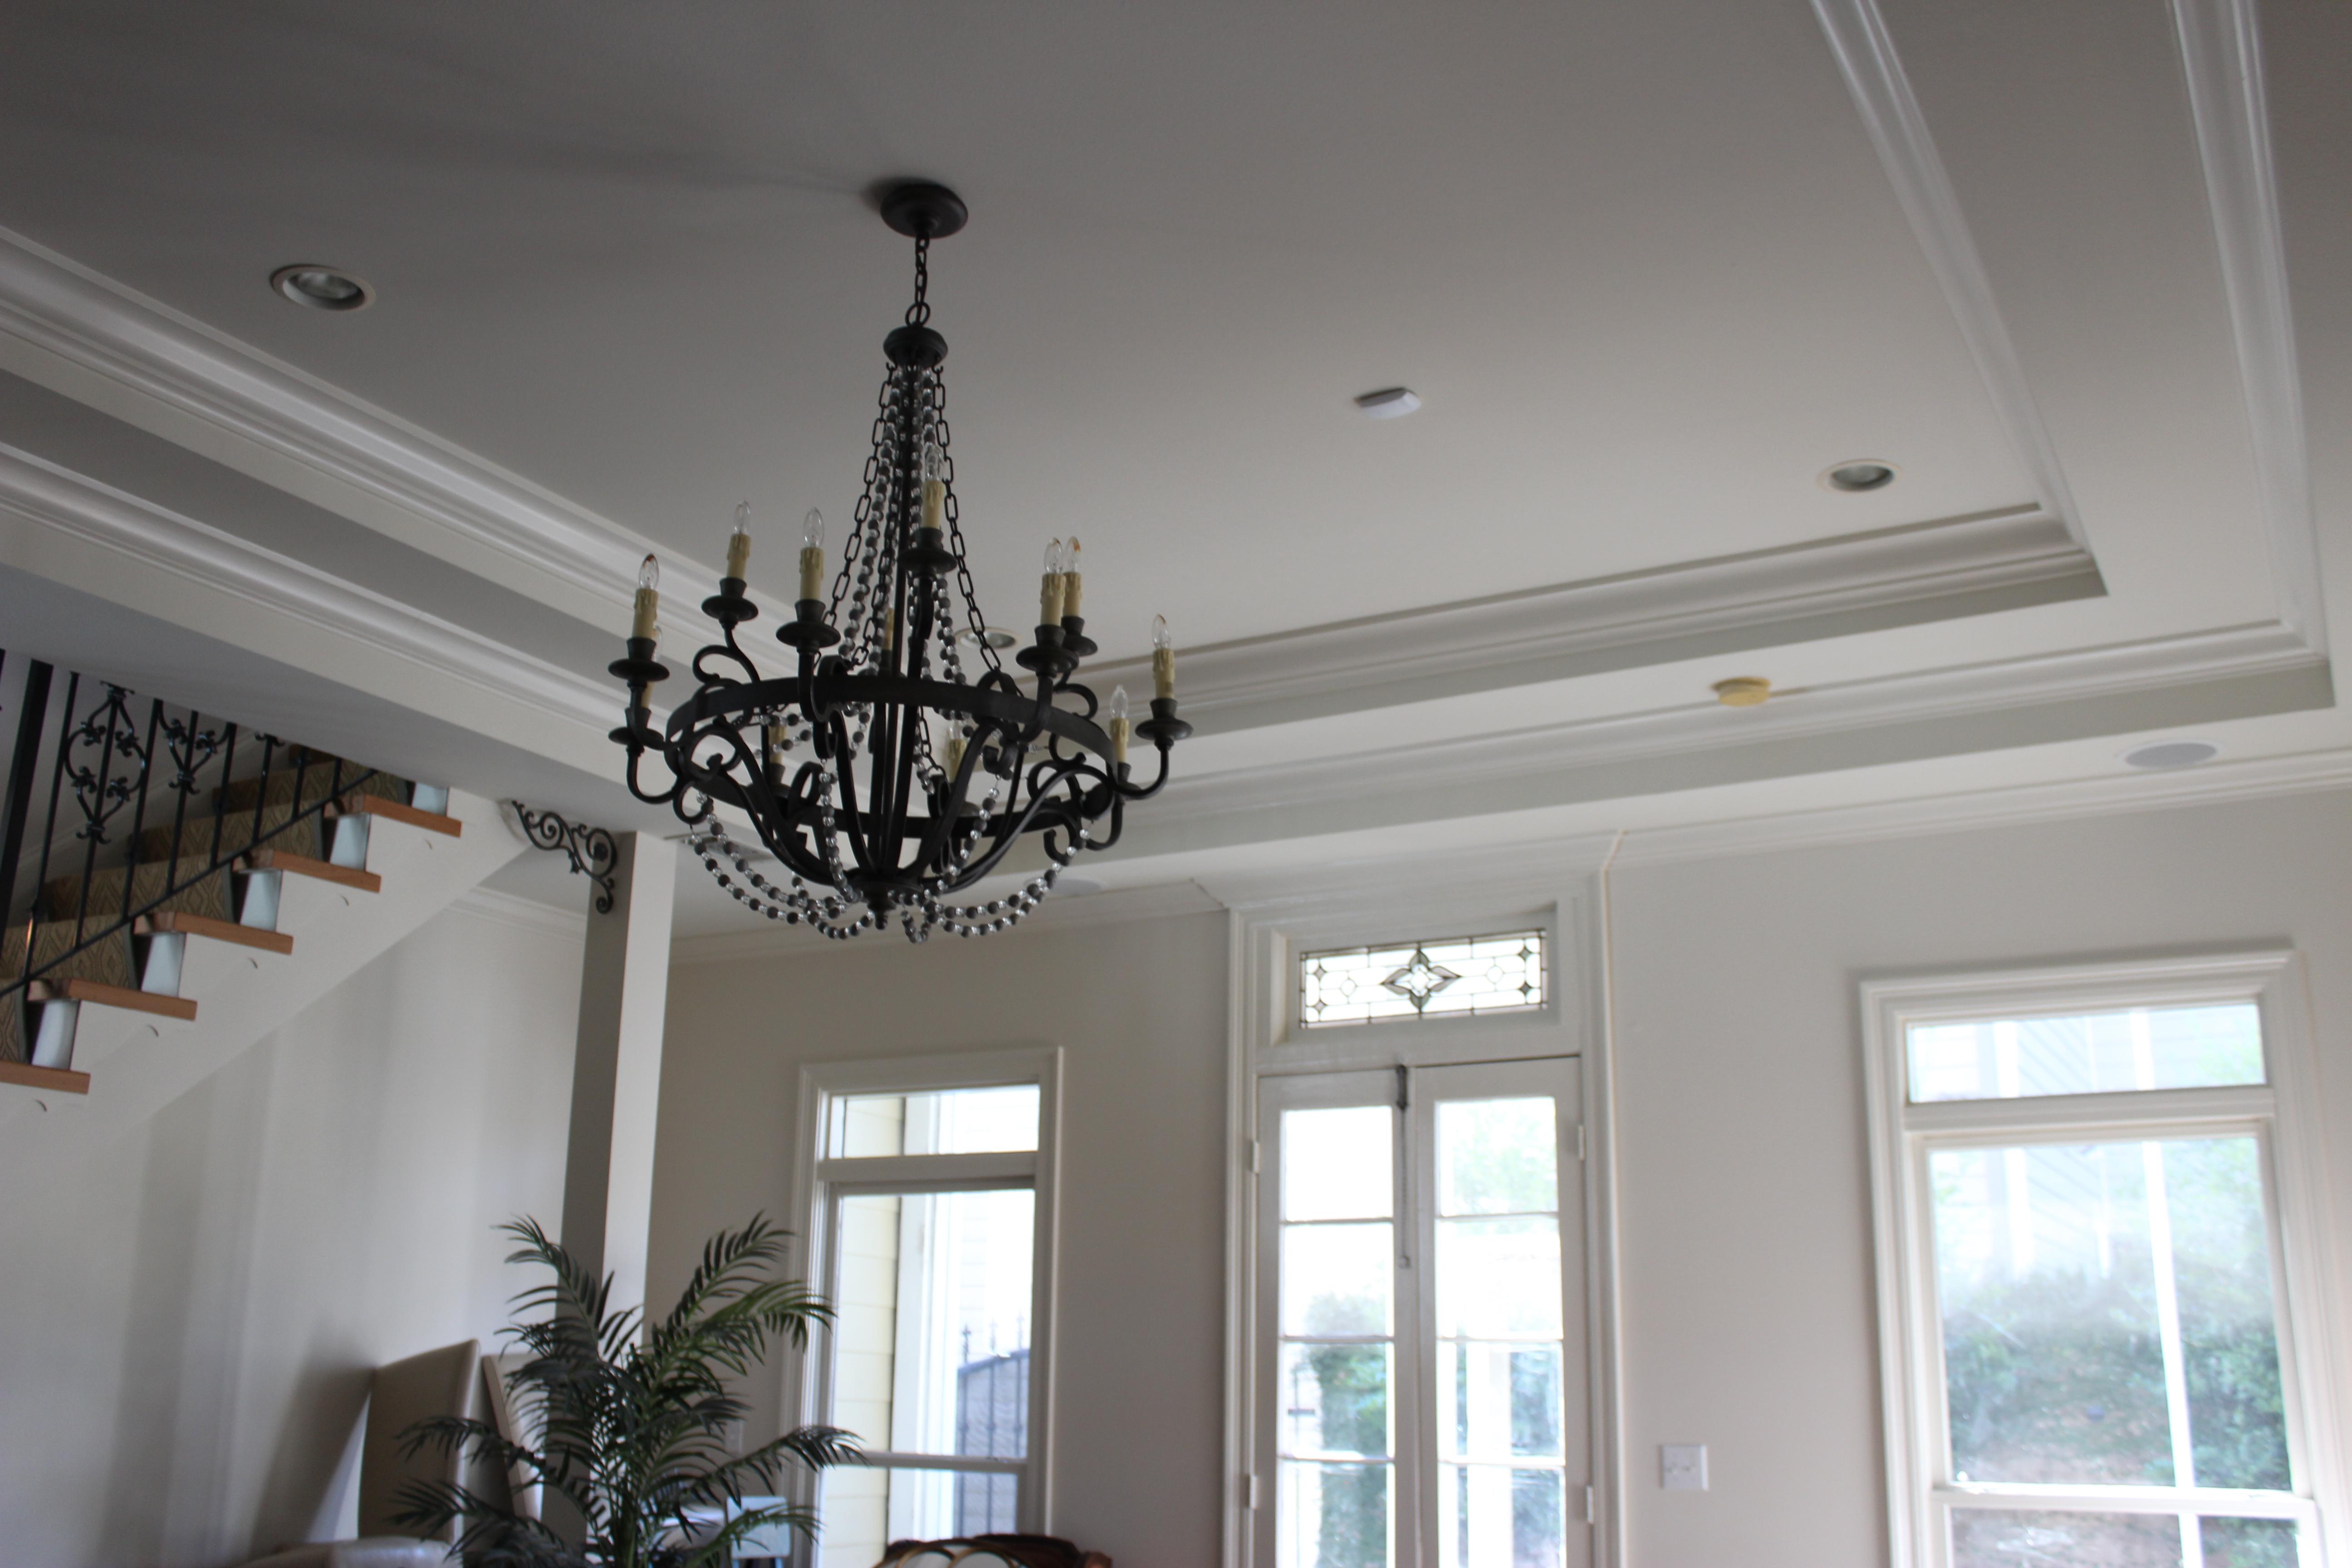 img_1845 & Jason Bertoniere Painting Contractor » Blog Archive Interior ...